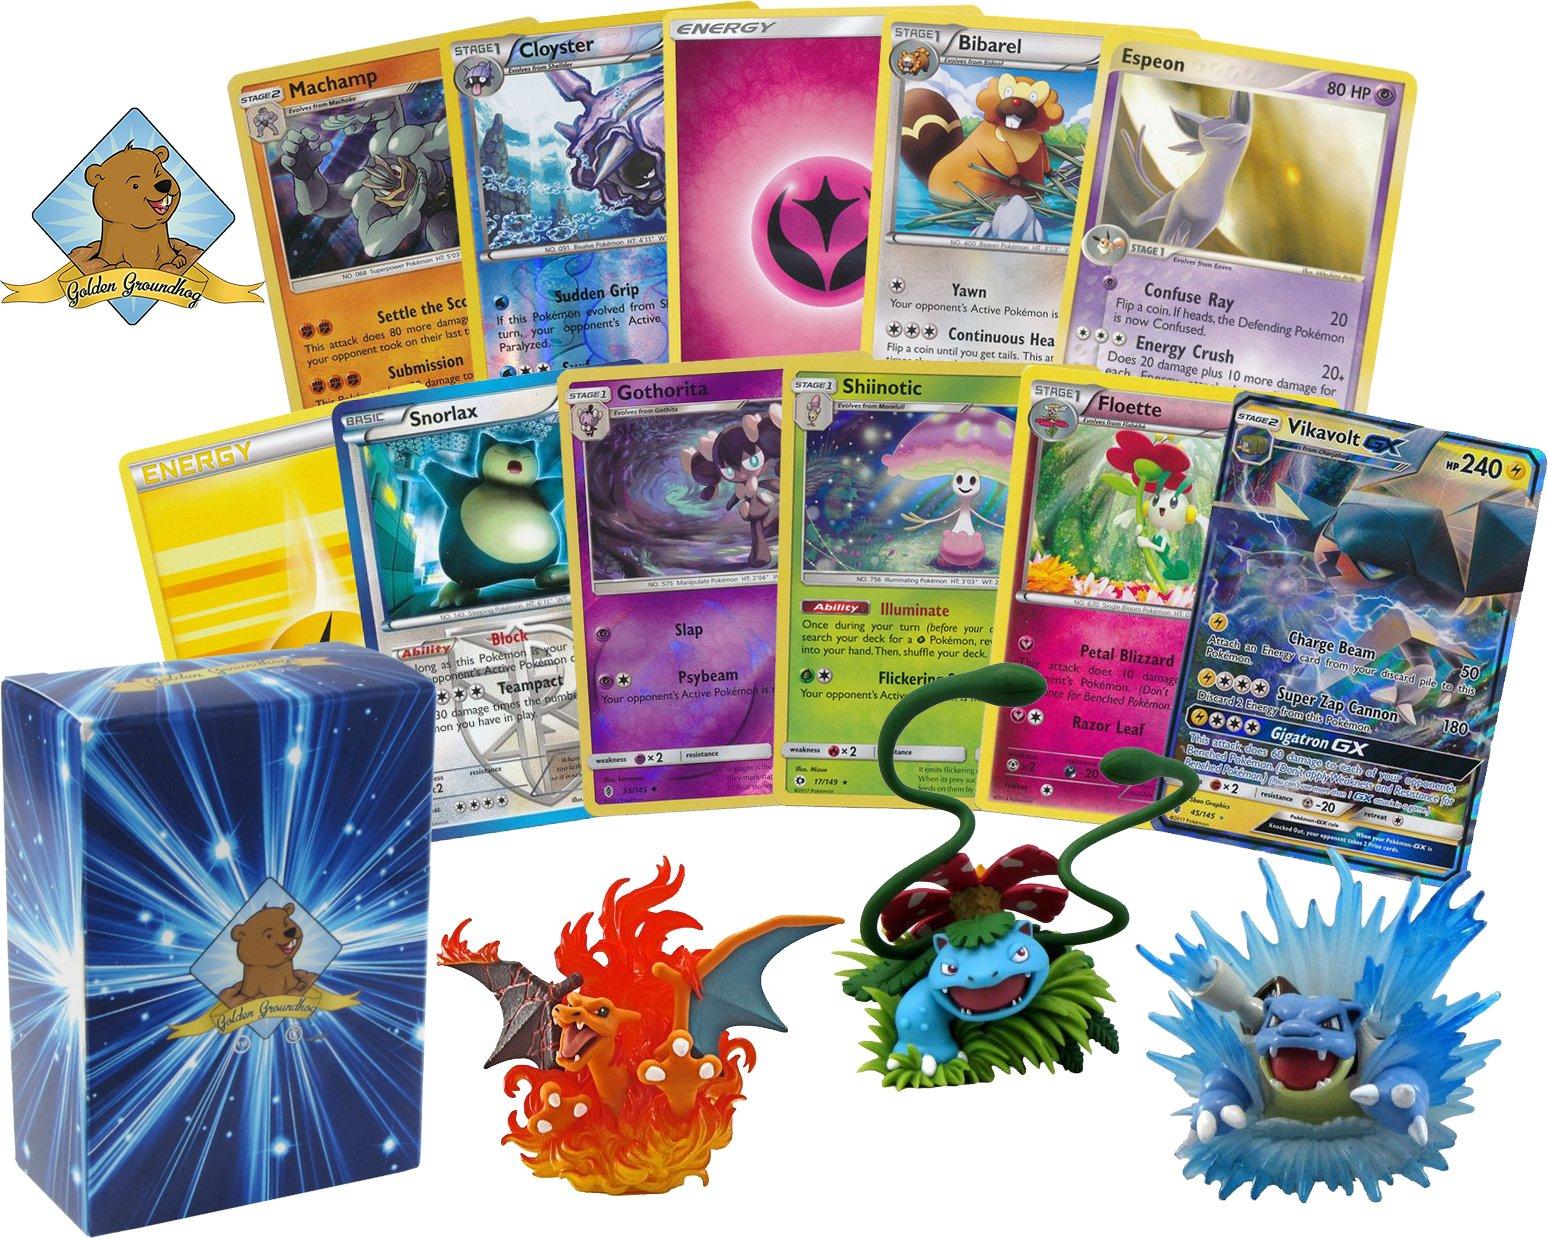 100 Pokemon Card Lot Featuring 1 GX and 1 Original Starter Pokemon Figure (Charizard, Blastoise, Venusaur)! Foils Rares Holos Energy! Includes Golden Groundhog Deck Box!